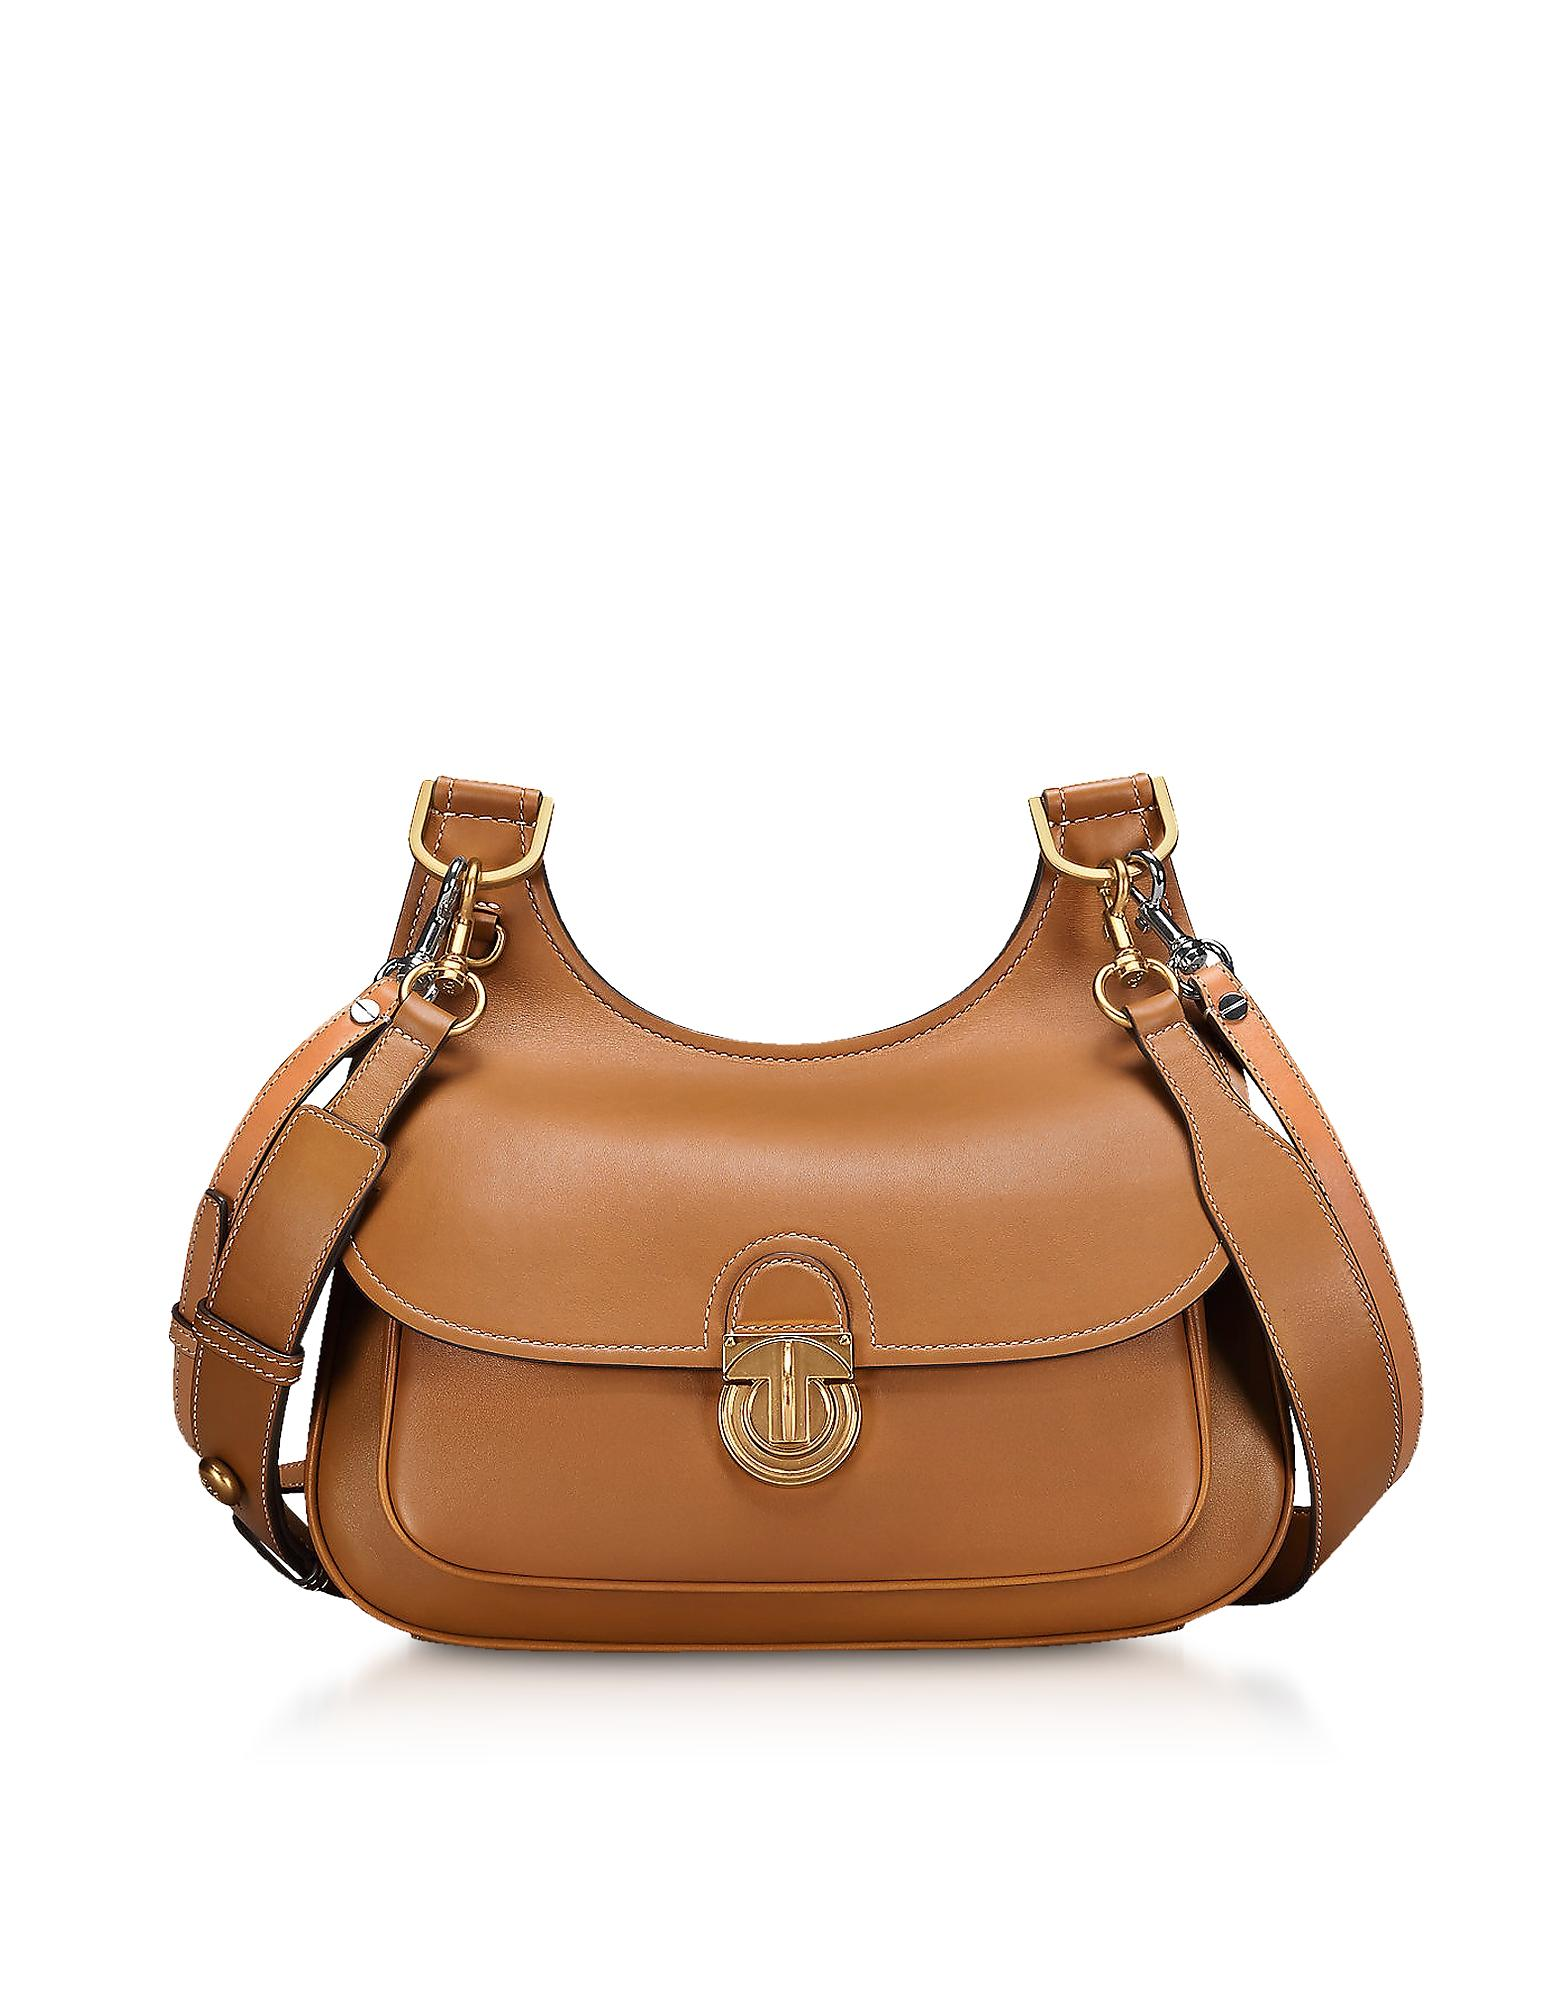 4037f459610 Tory Burch James Smooth Leather Saddle Shoulder Bag In Moose